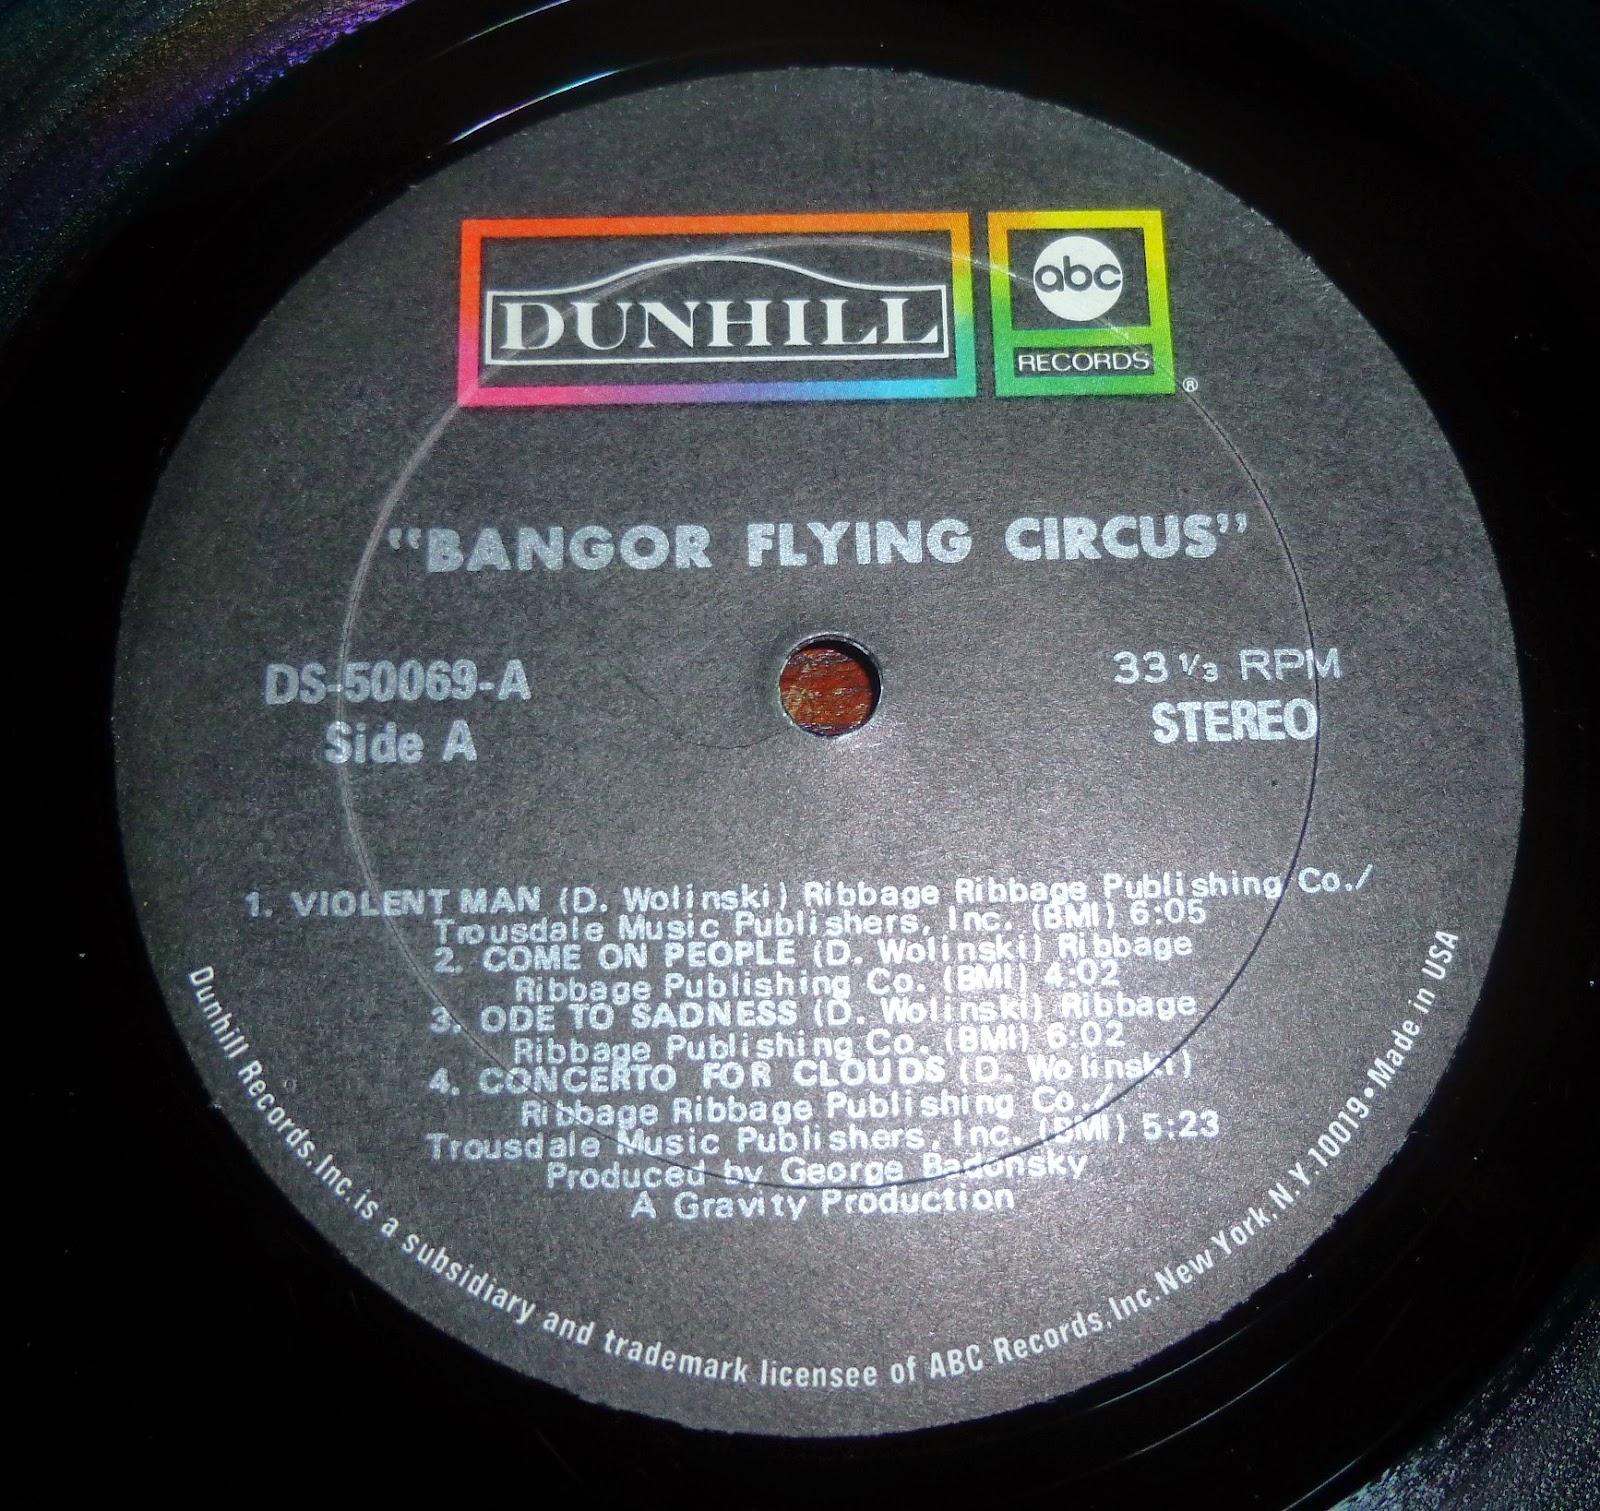 Bangor Flying Circus Bangor Flying Circus